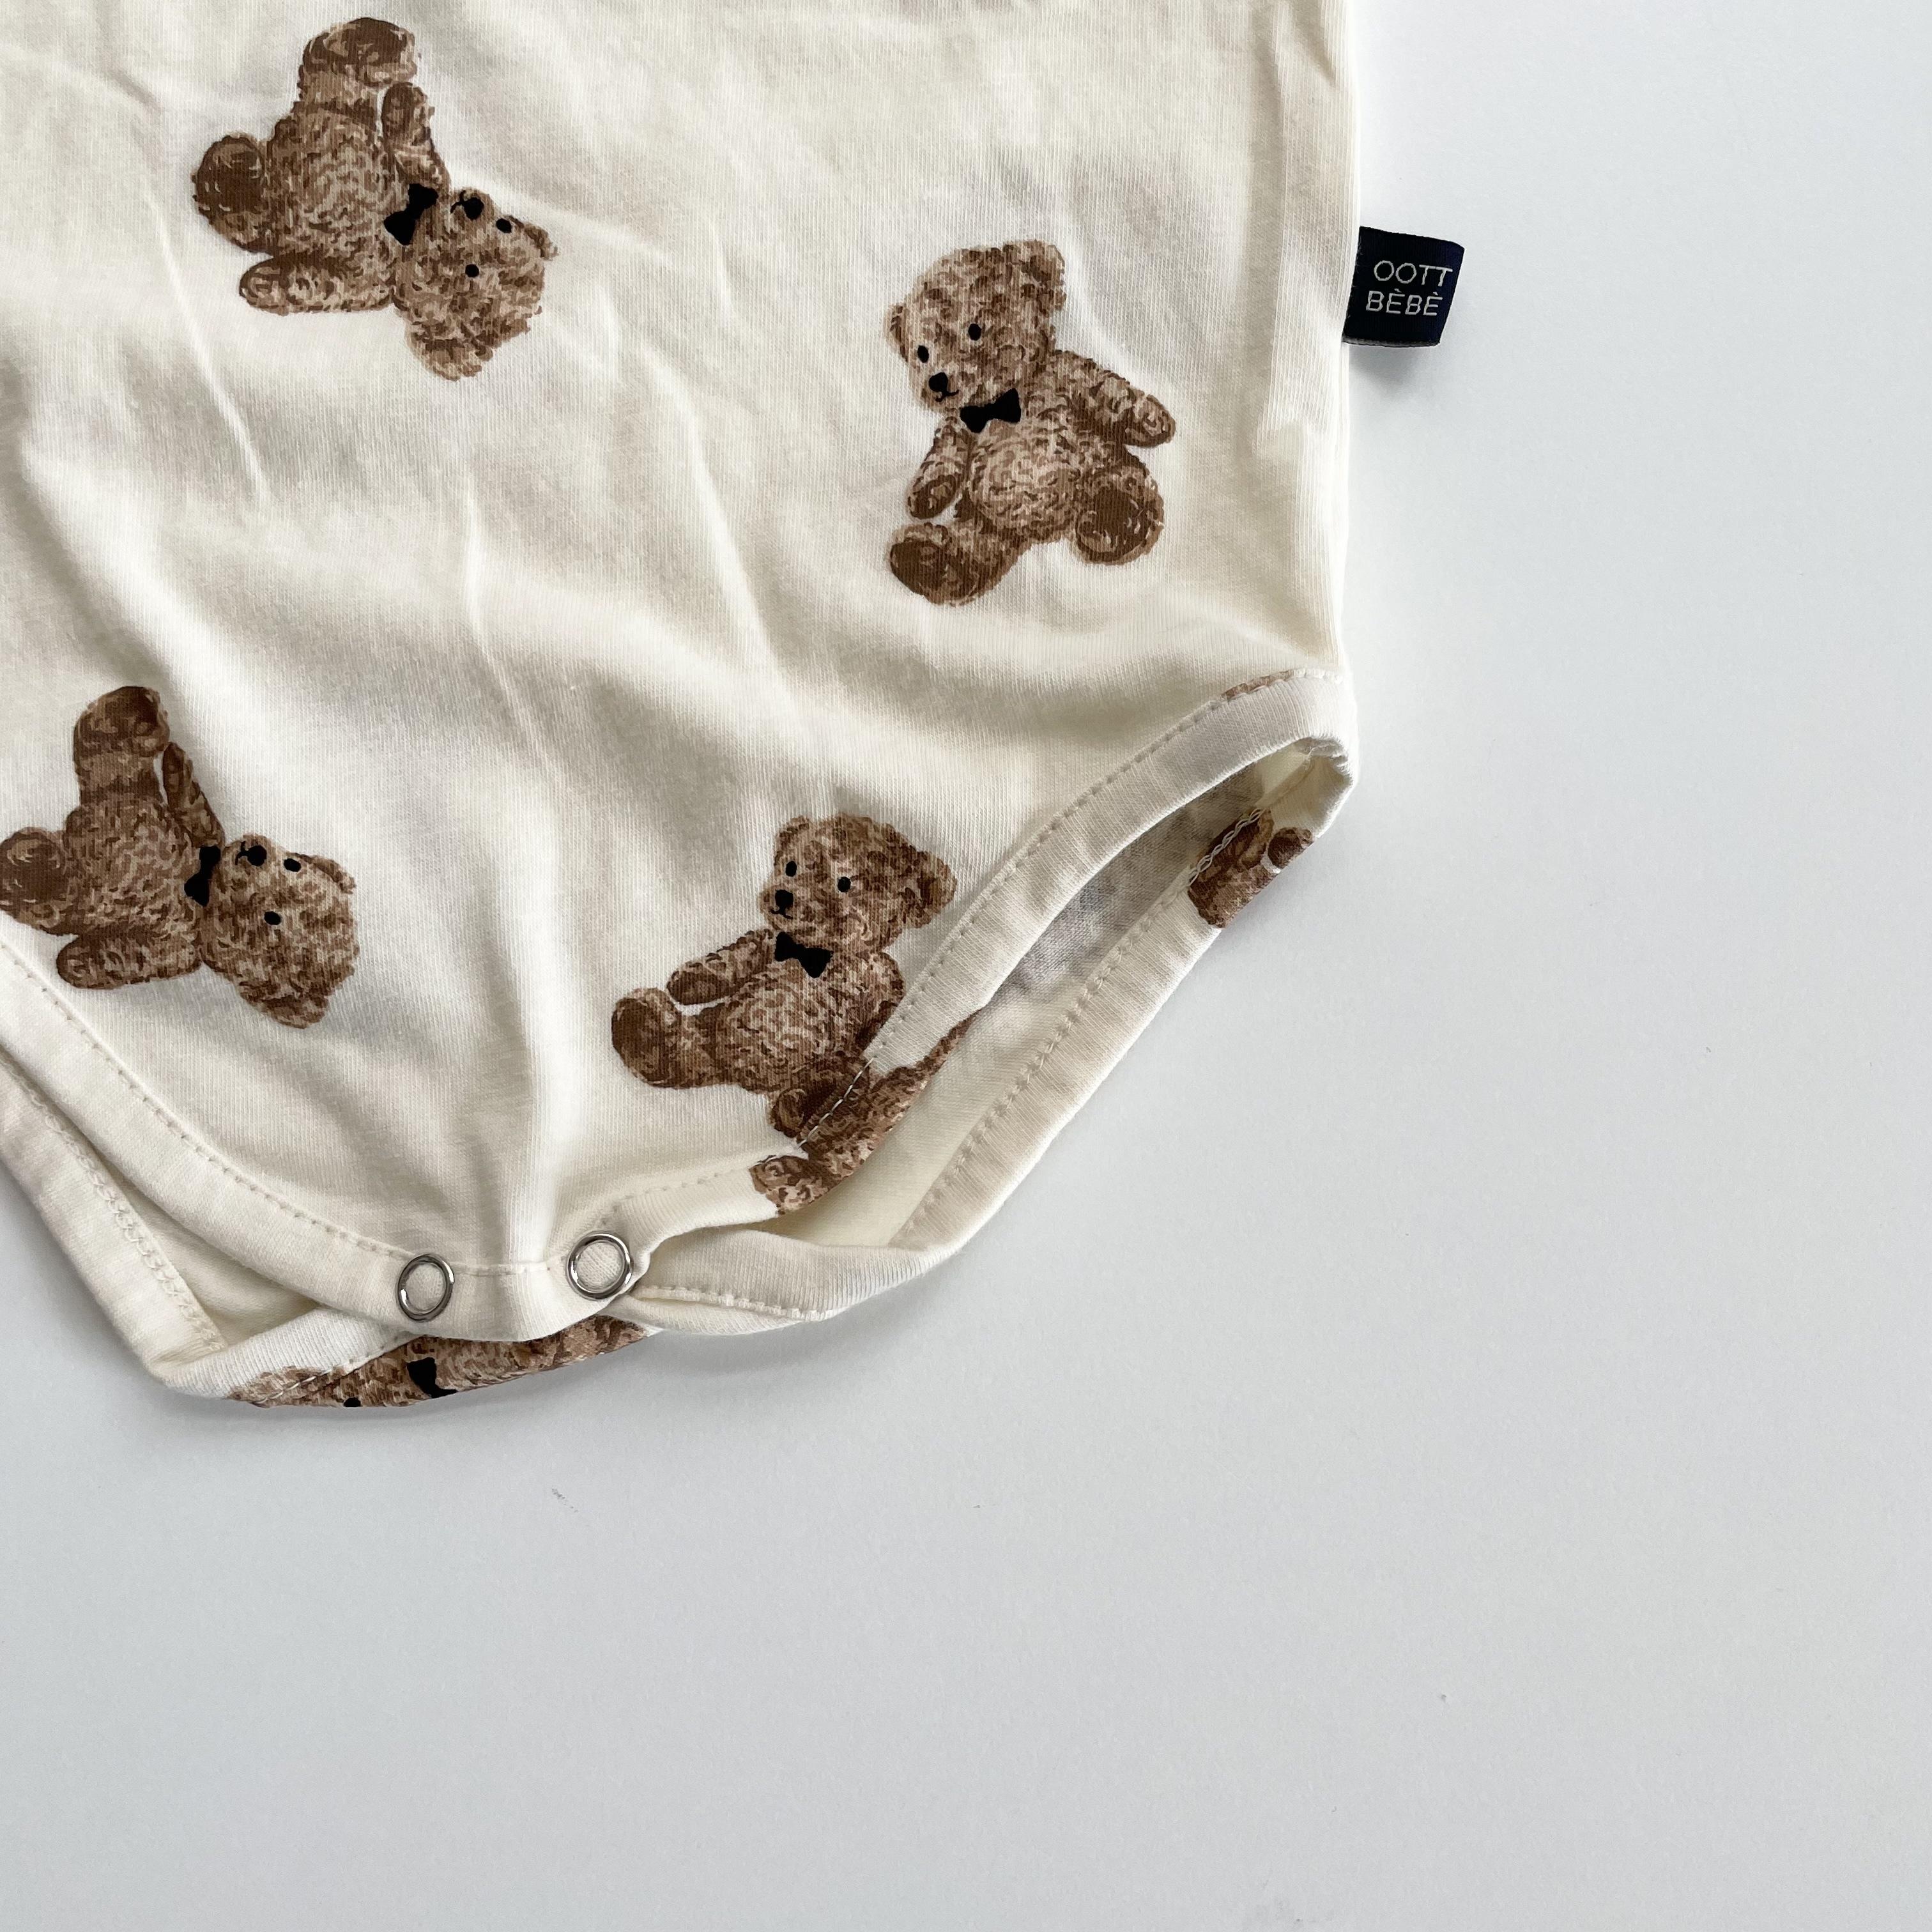 NO.1424. bear  rompers + bonnet / OOTT bebe